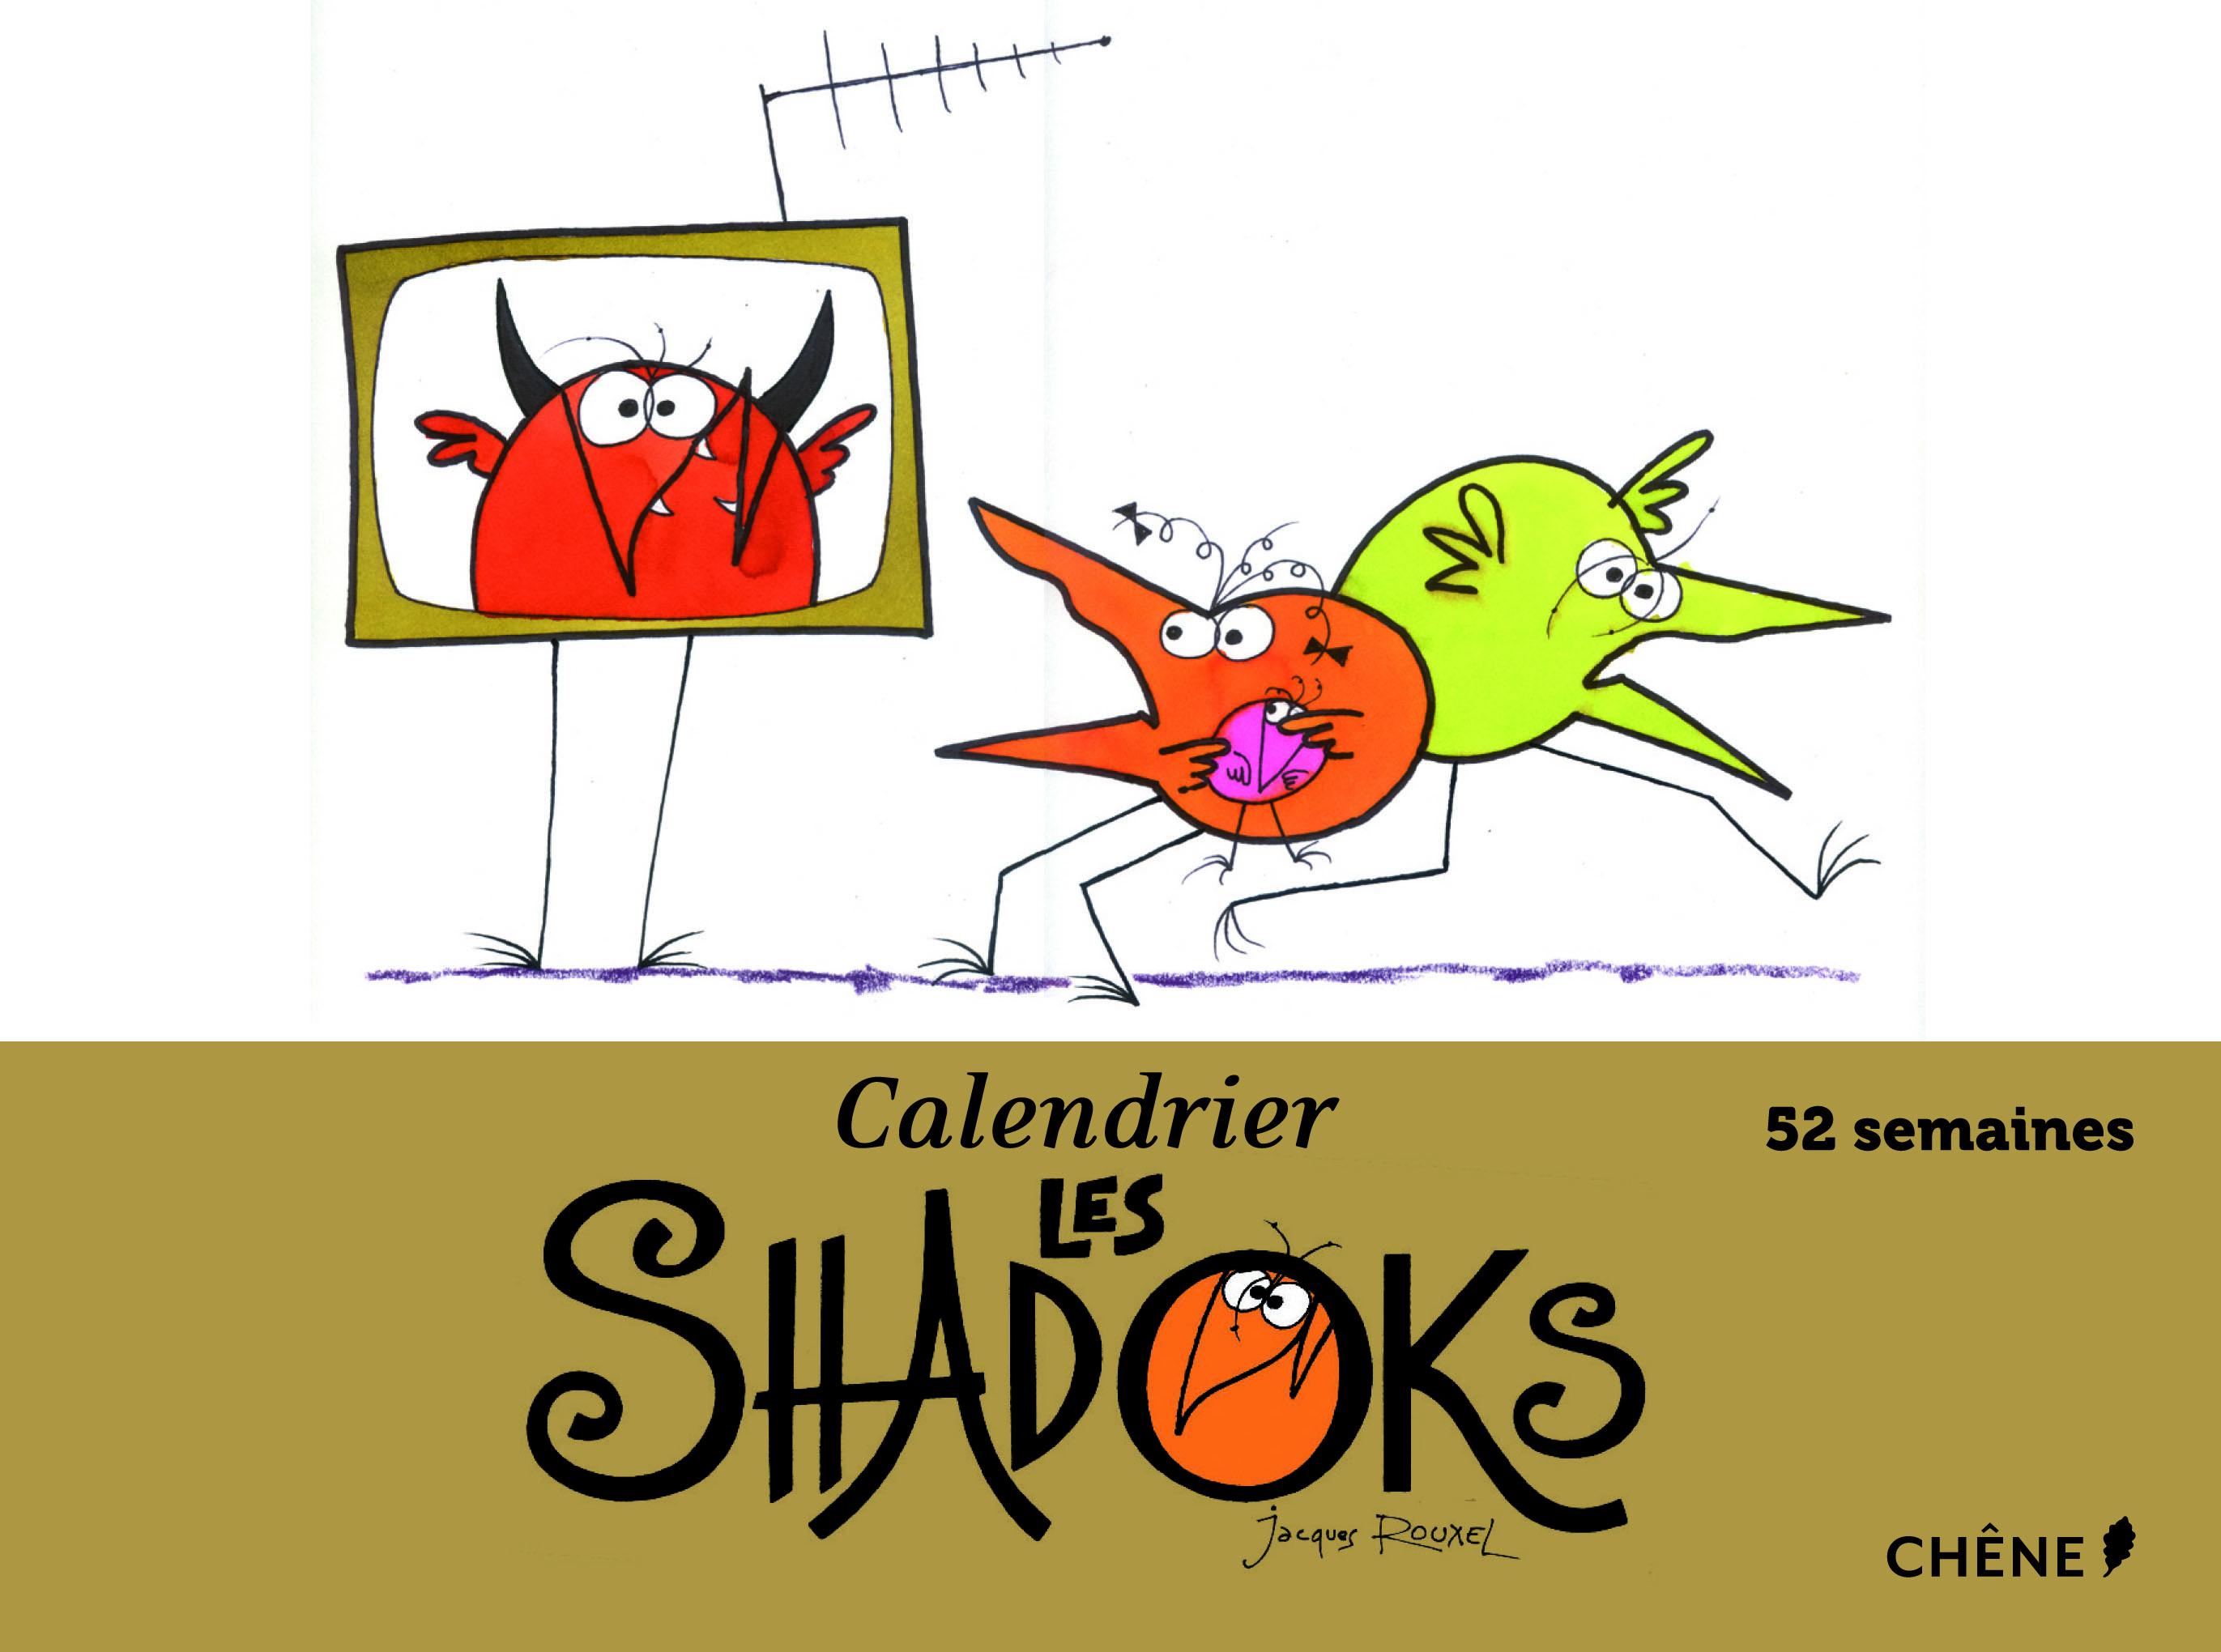 2012-12-04-Couv_Shadoks_300dpi_CMJN.jpg